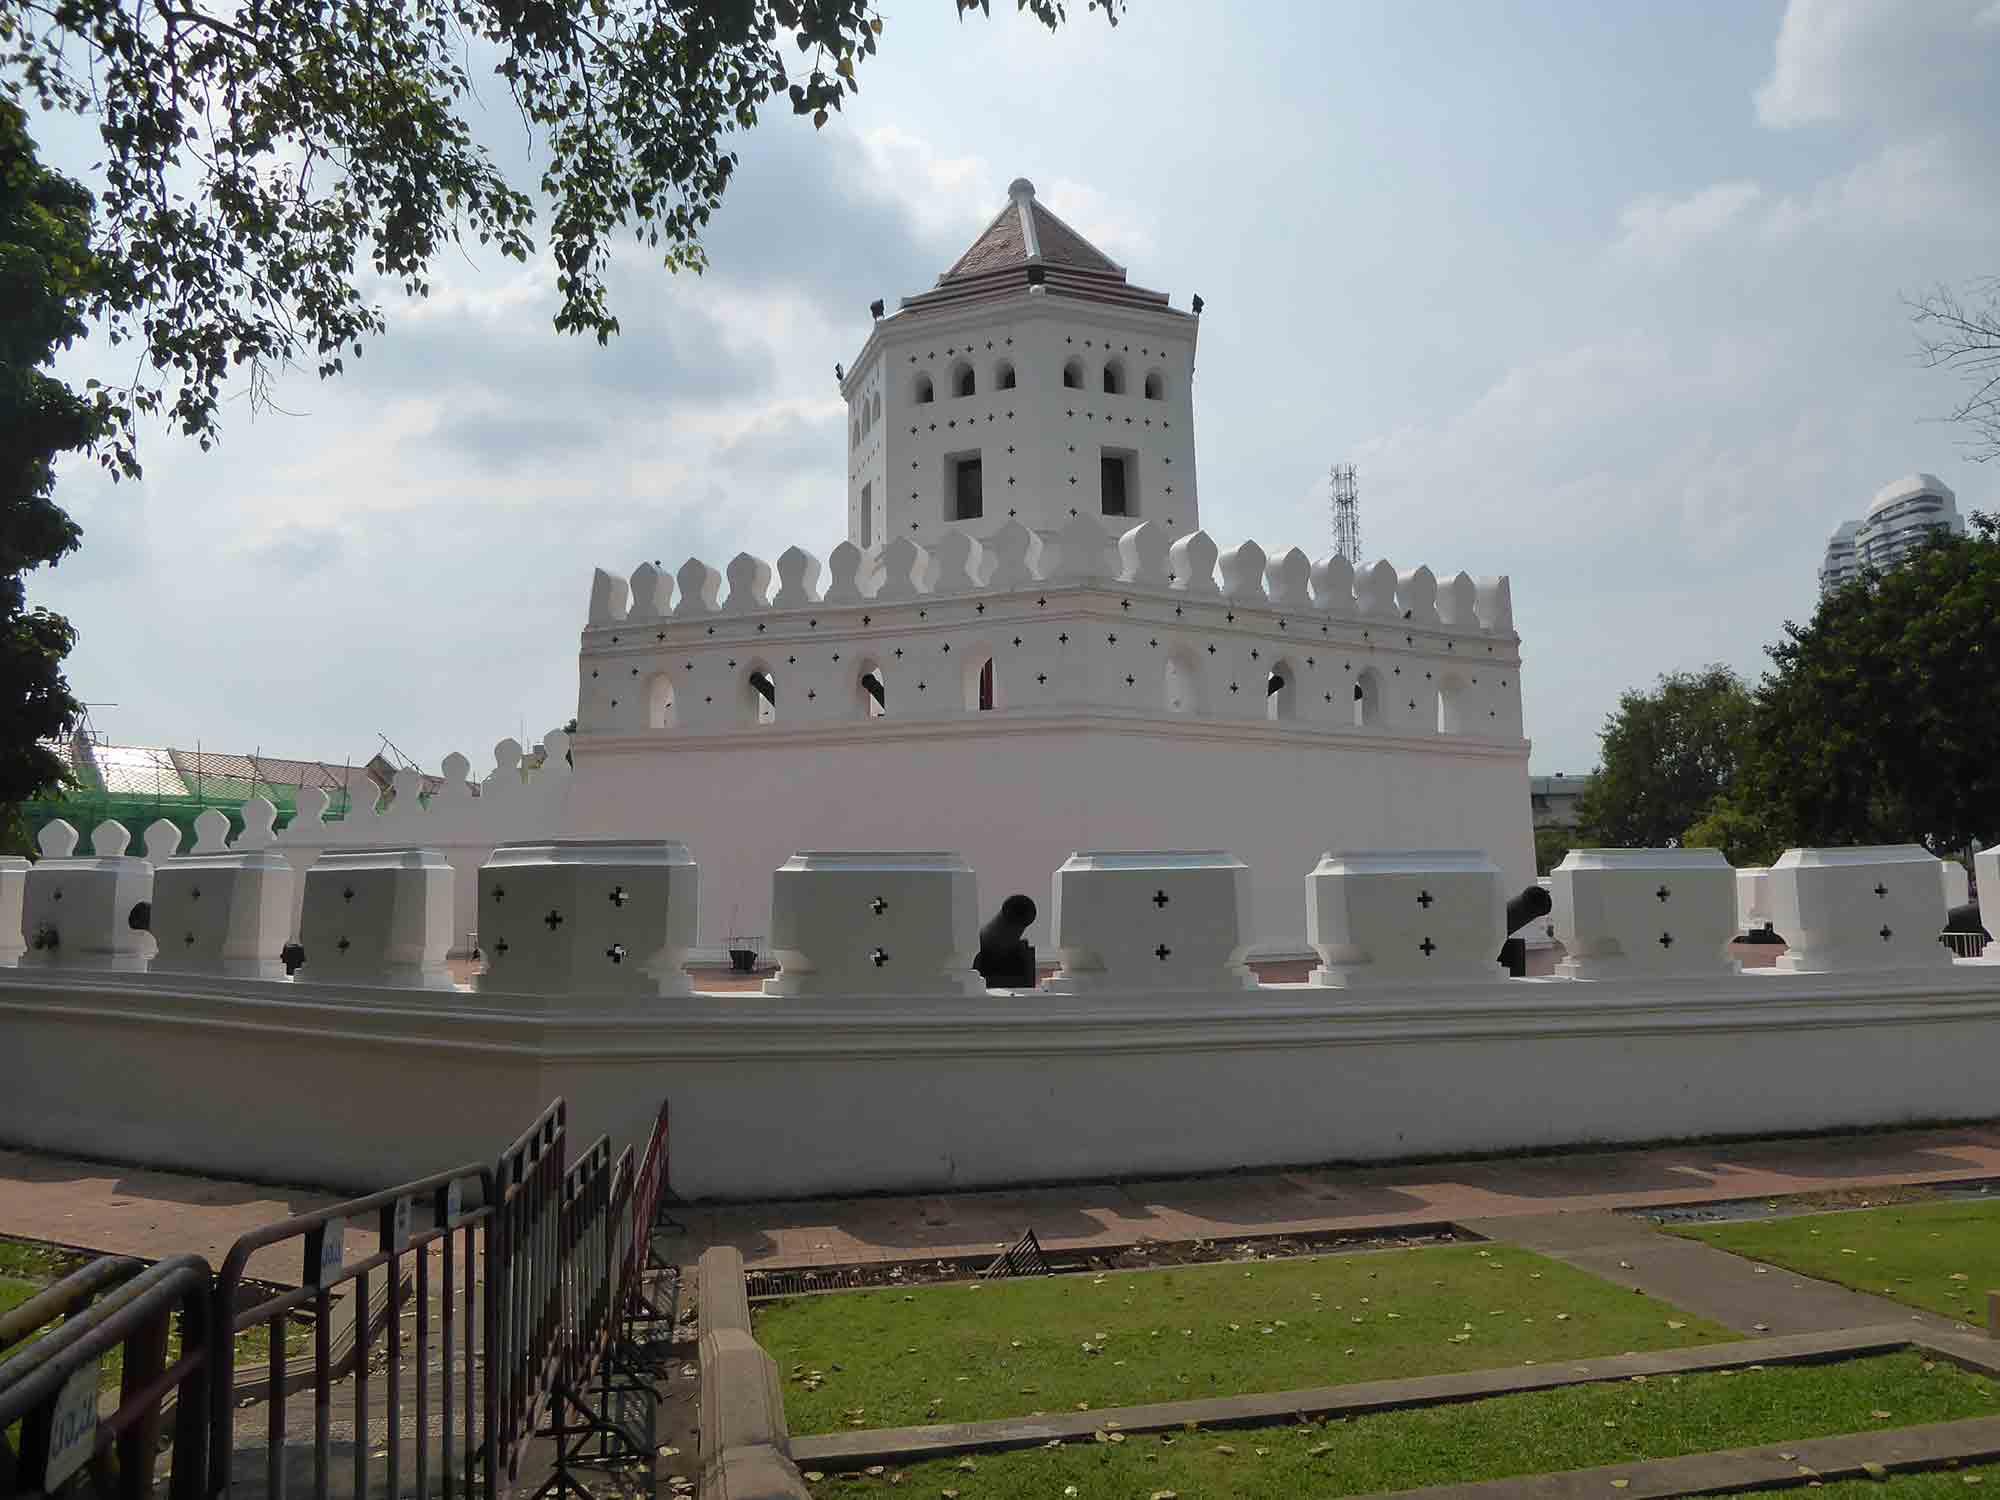 P1070490 - Landmarks & Monuments